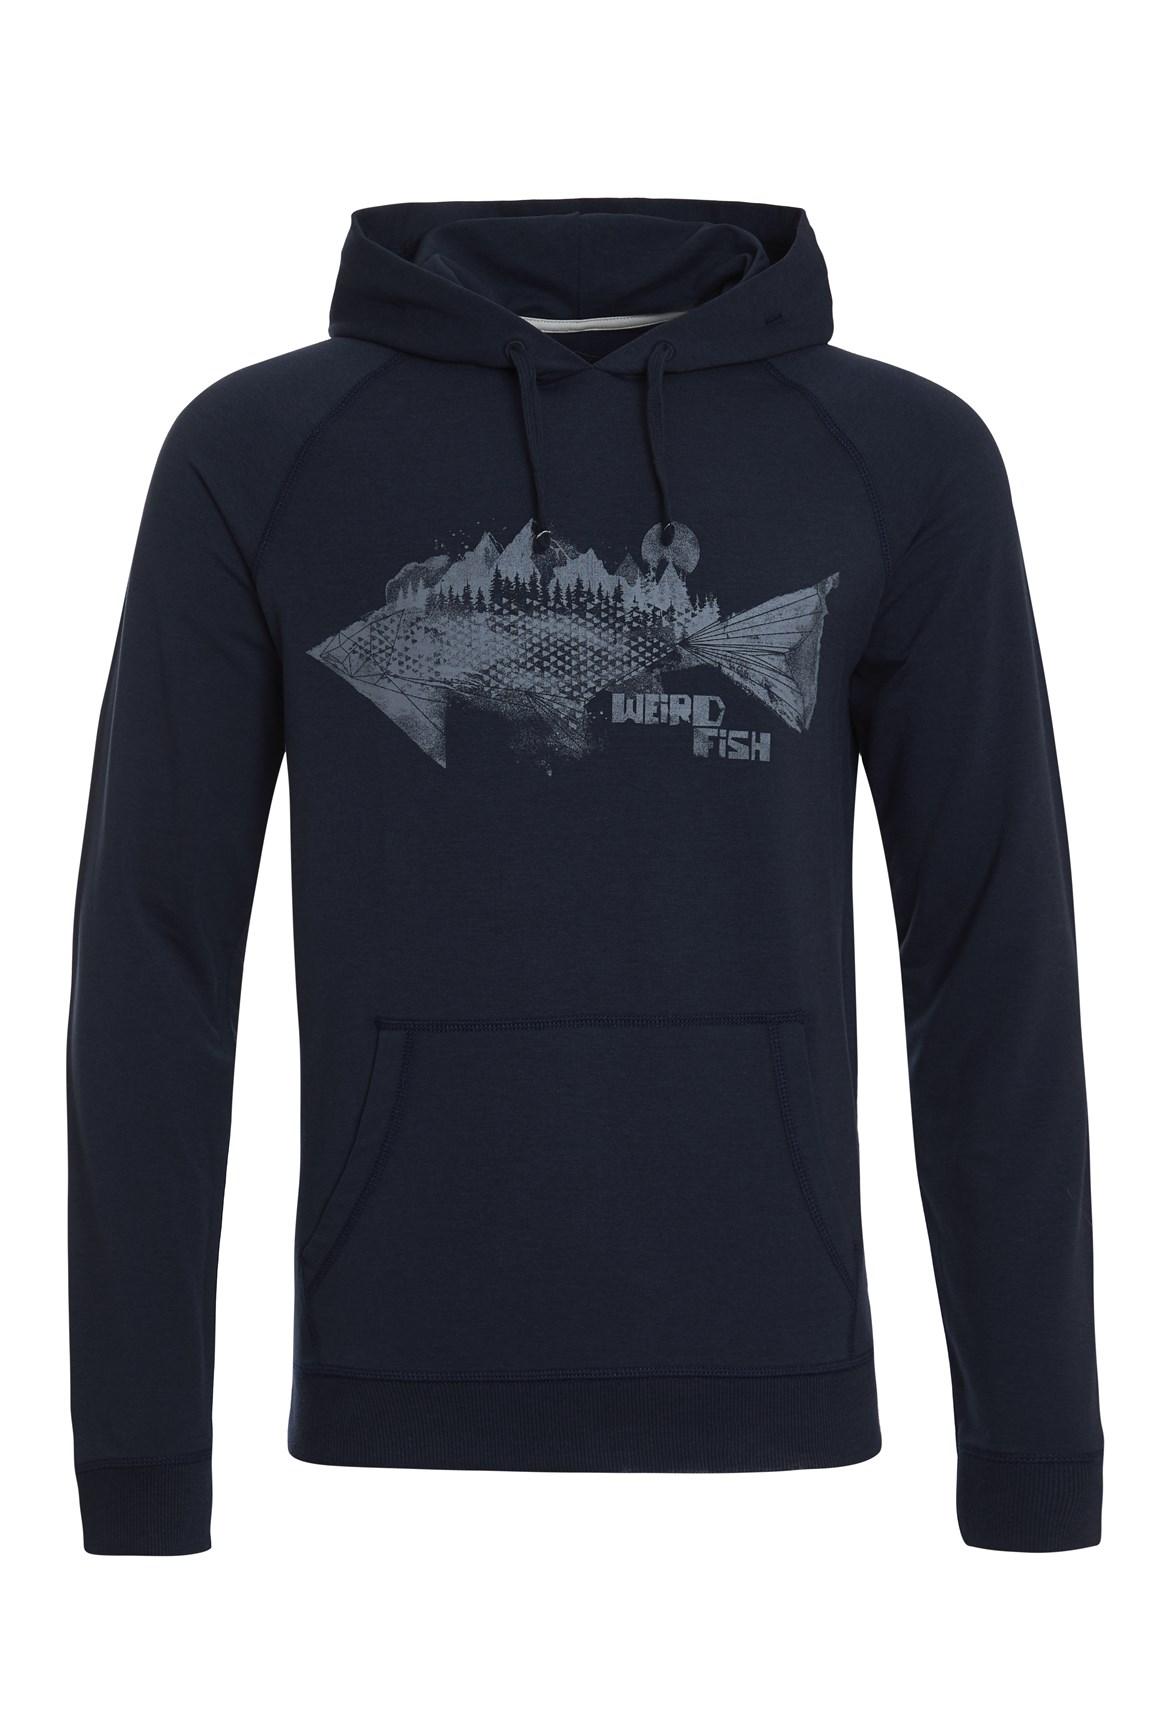 Men's Tops Weird Fish Ares Bamboo Branded Hoodie Dark Navy Size 5XL